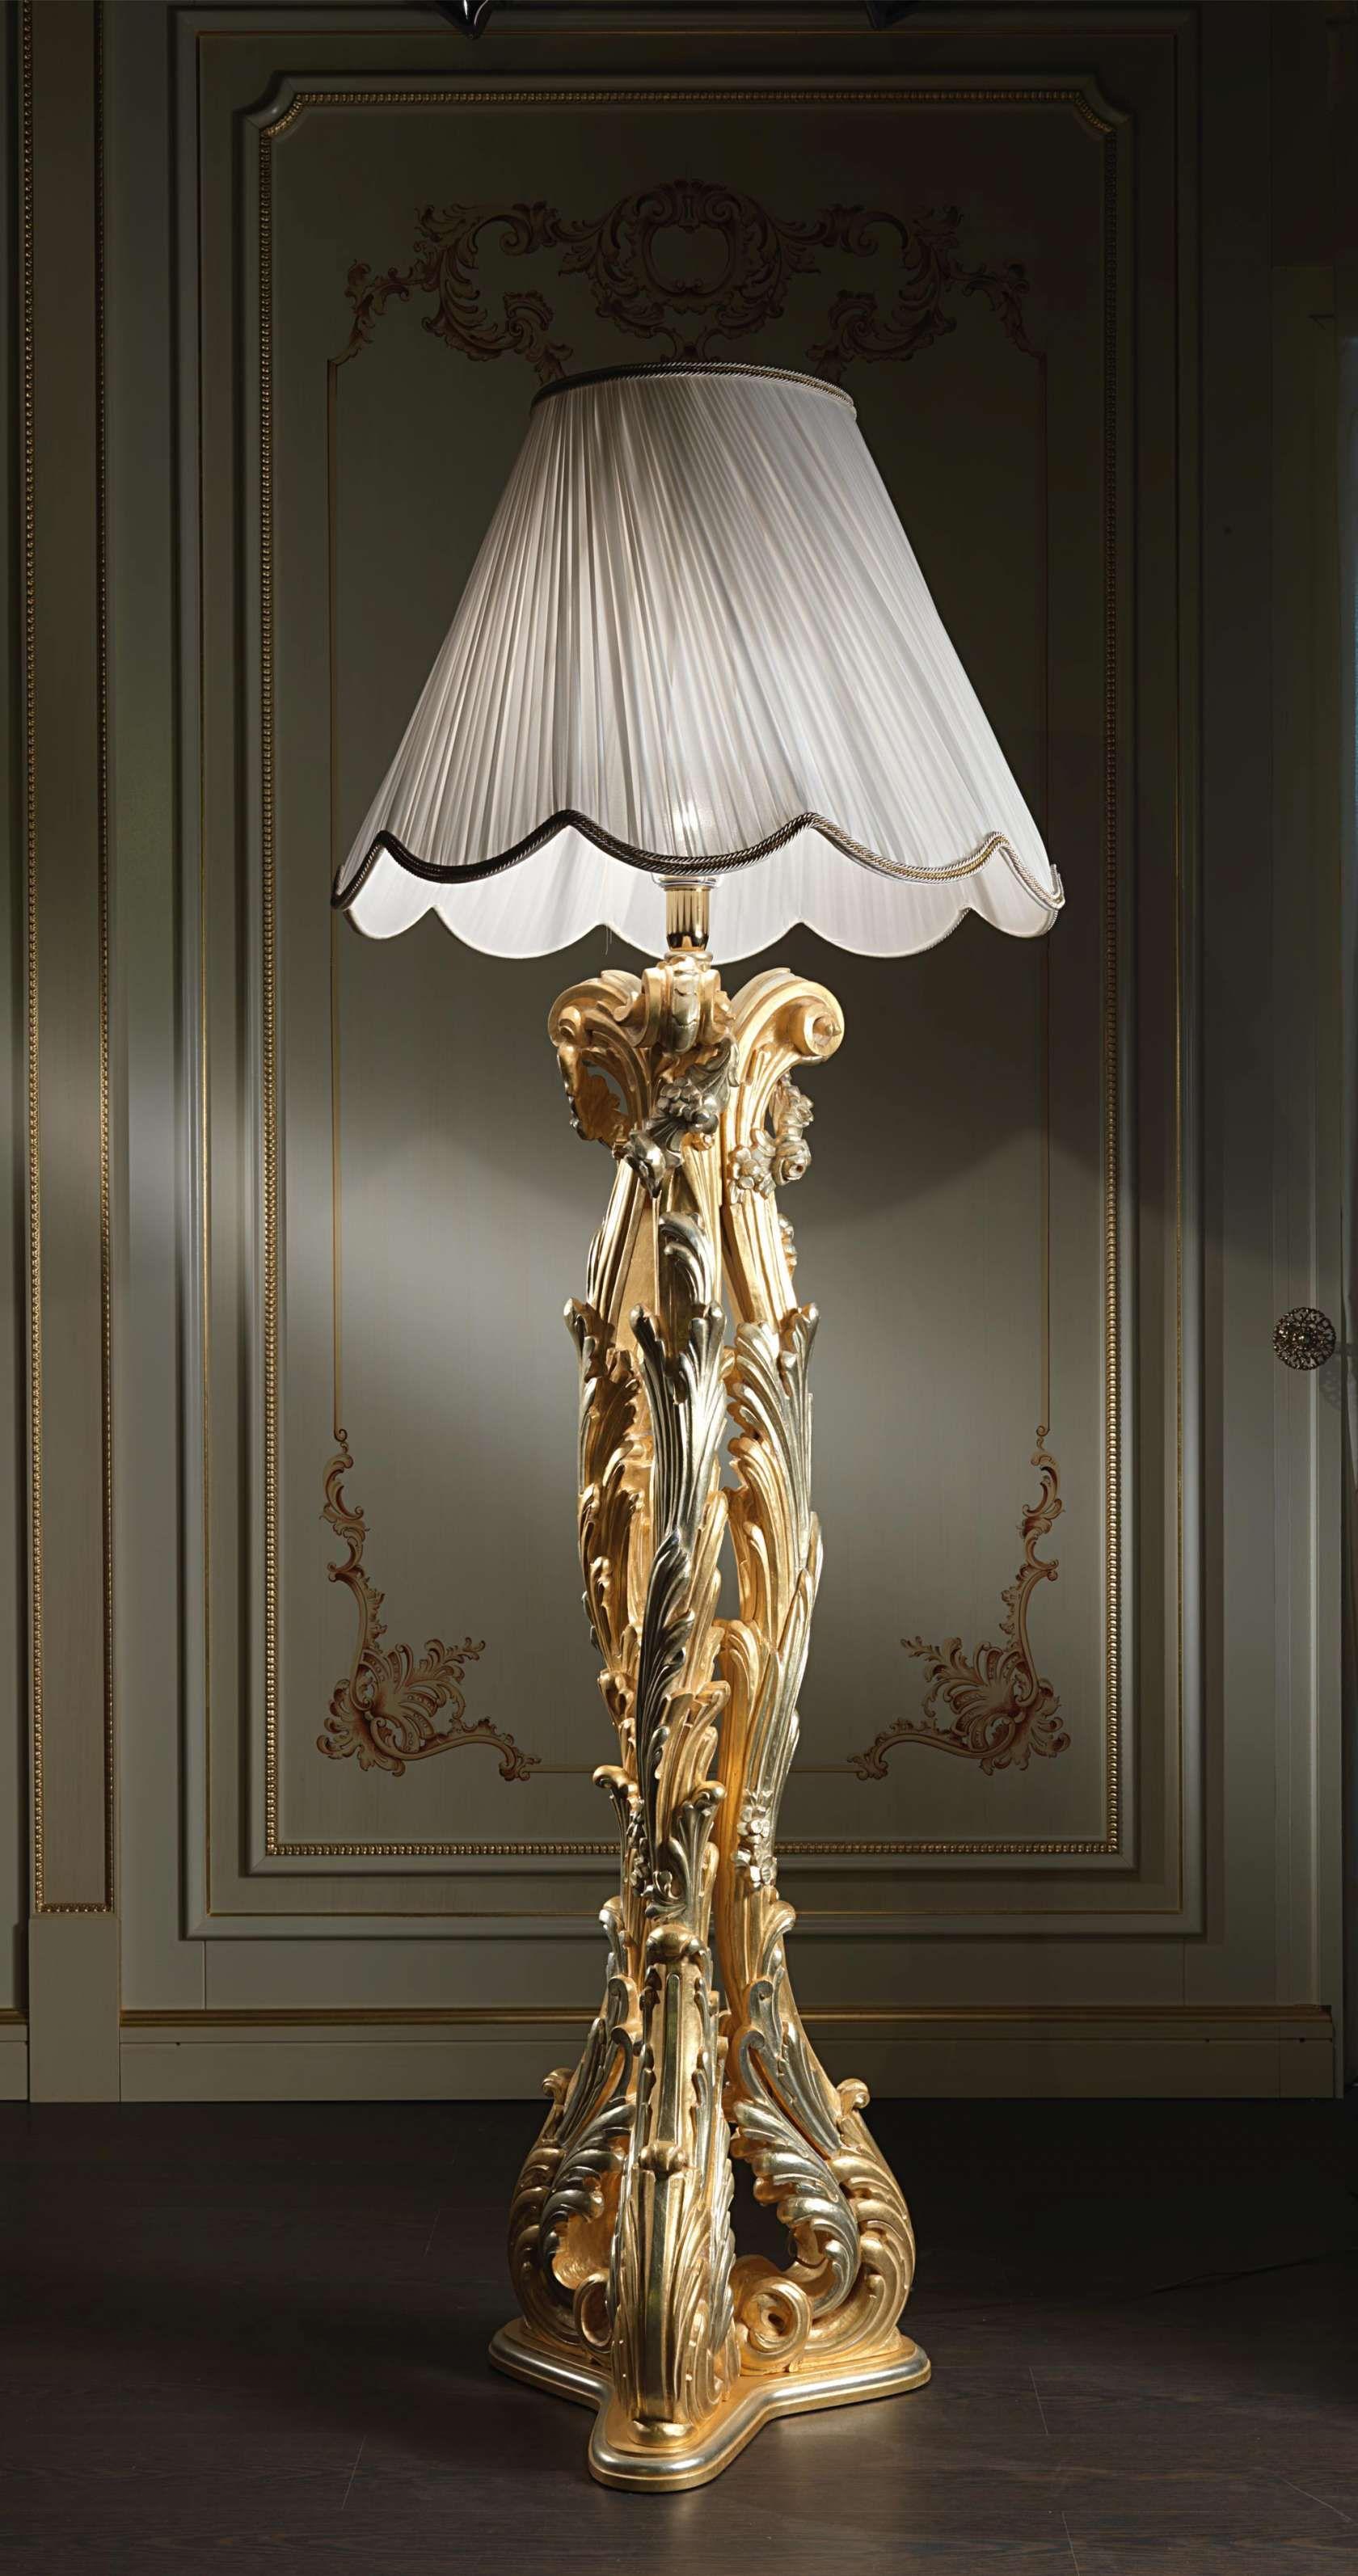 Classic floor lamp in baroque style vimercati classic furniture classic floor lamp in baroque style vimercati classic furniture aloadofball Choice Image